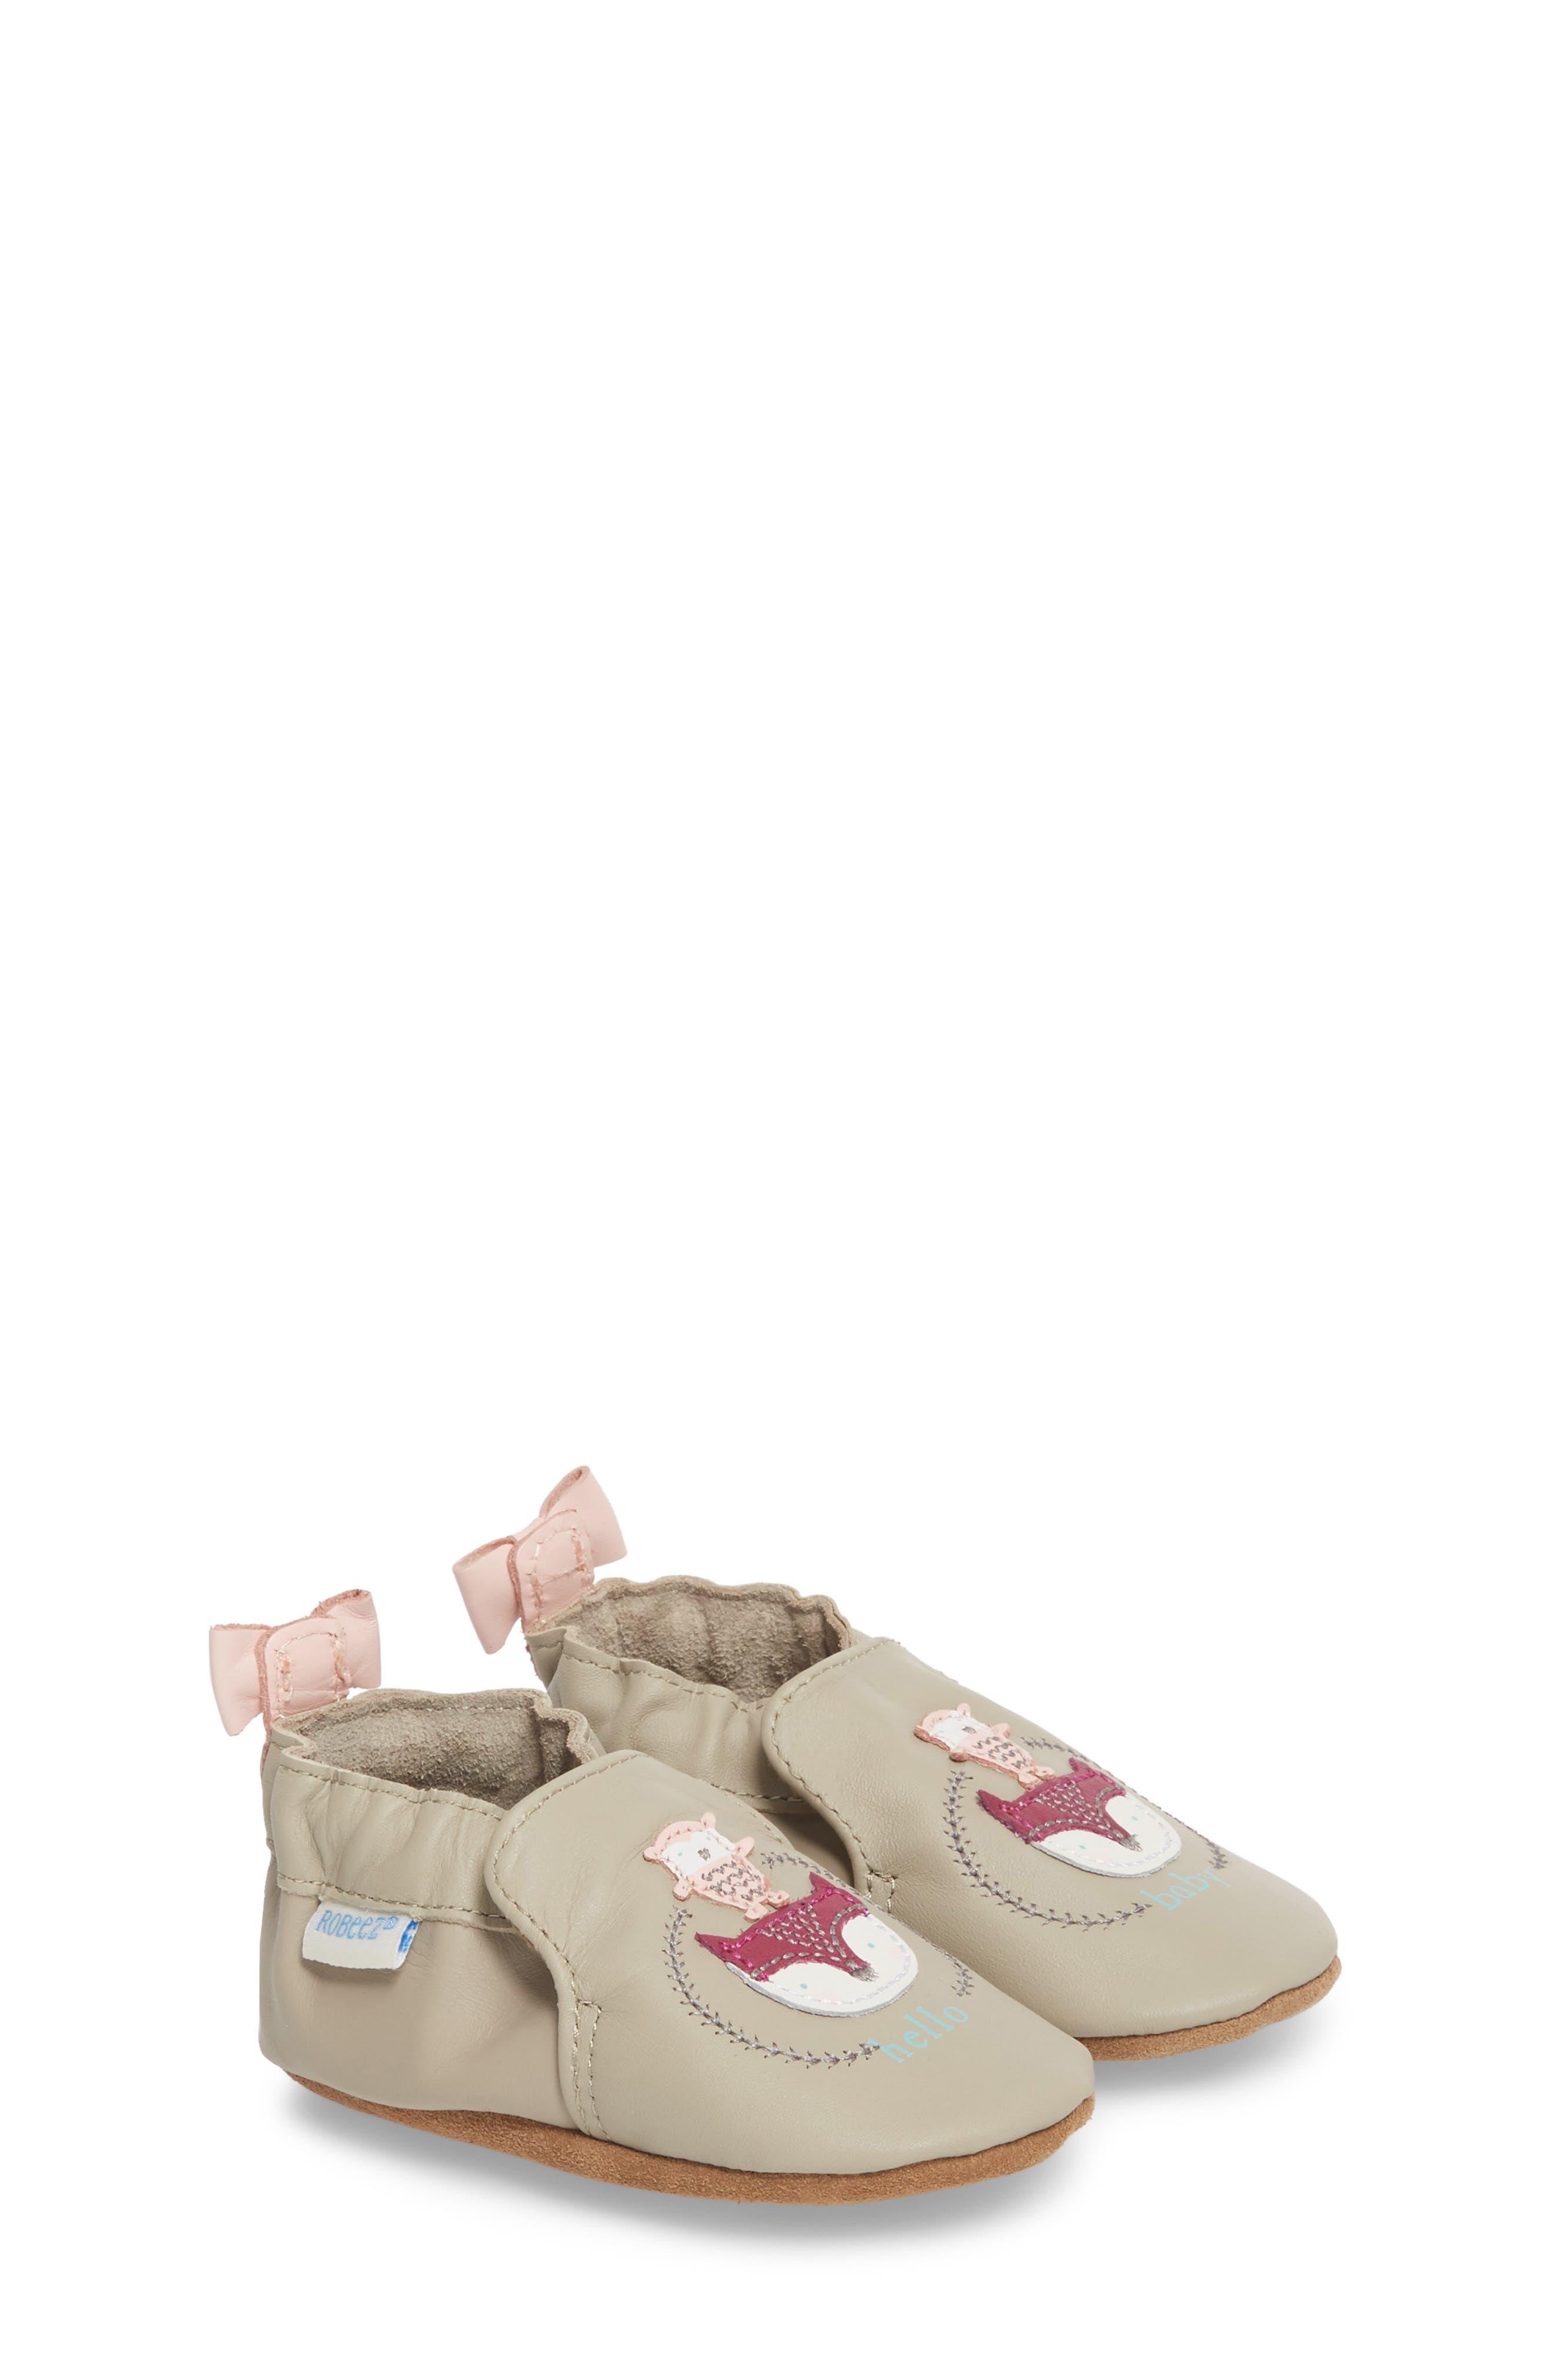 Hello Baby Friends Moccasin Crib Shoe,                         Main,                         color, Light Grey